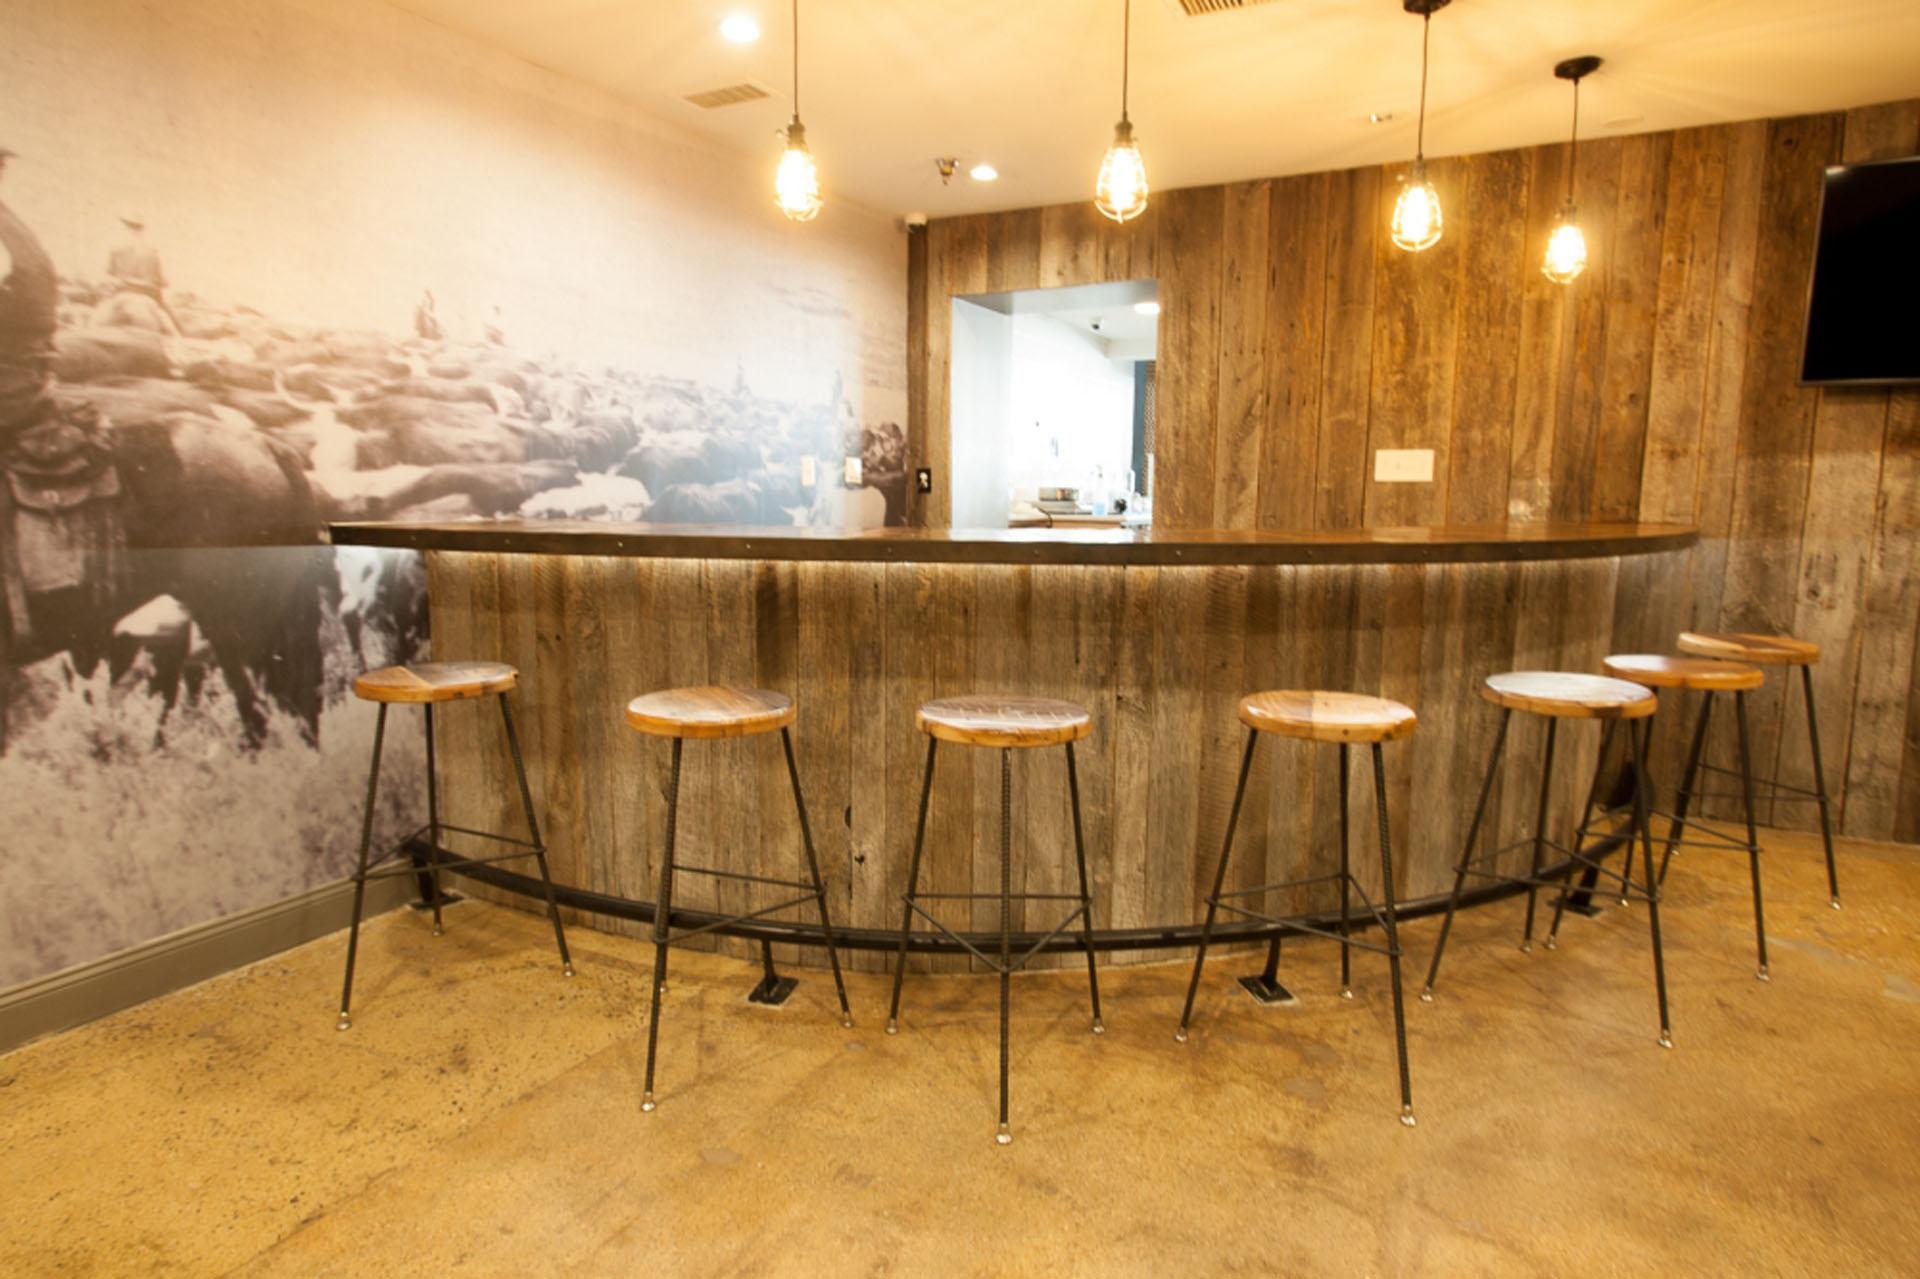 Texas jacks rustic restaurant furniture